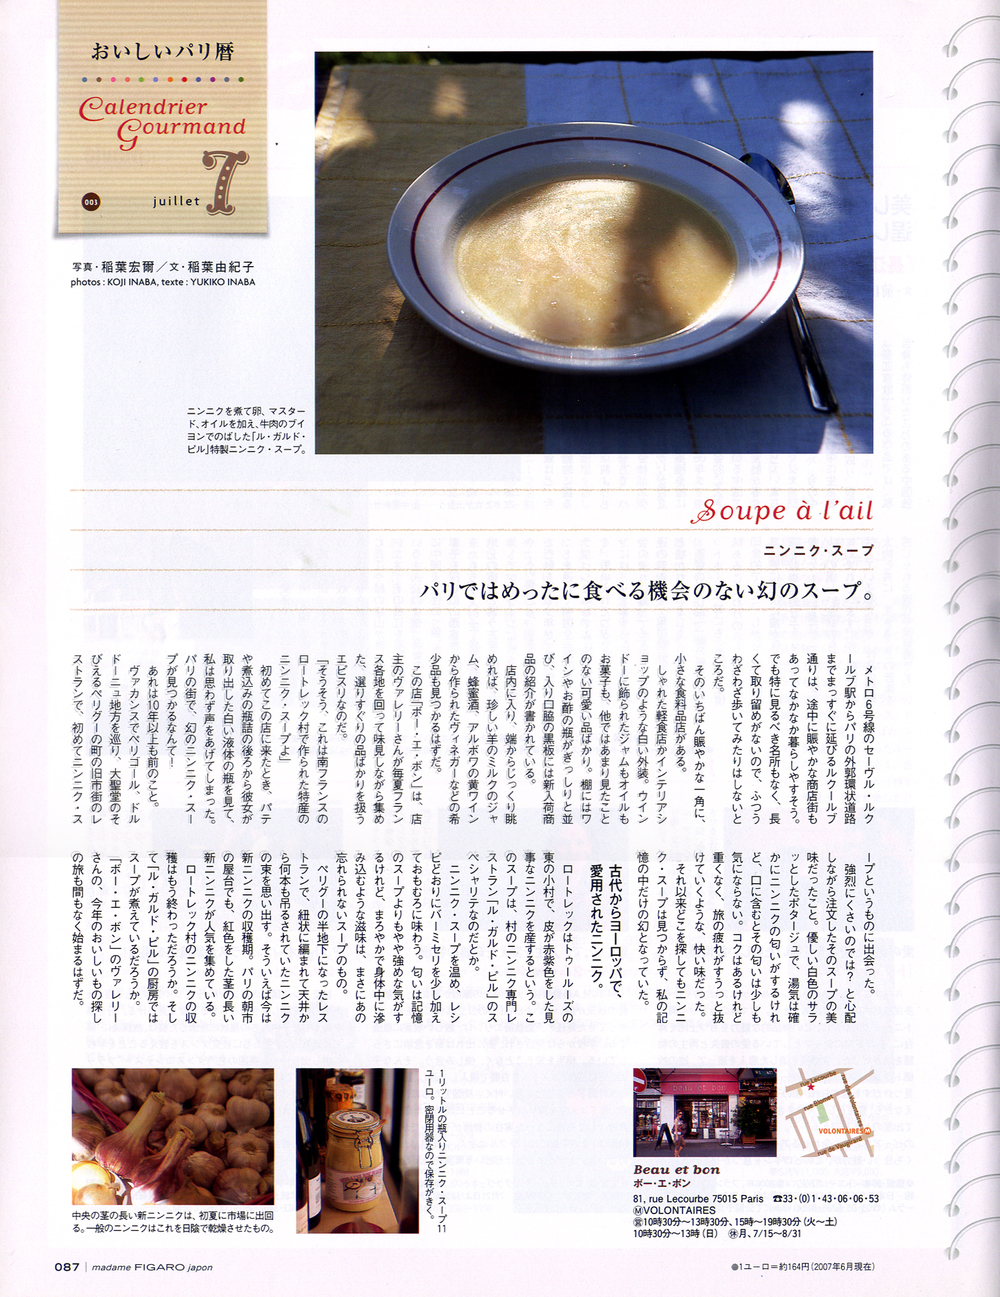 LE FIGARO JAPON JUILLET 2007